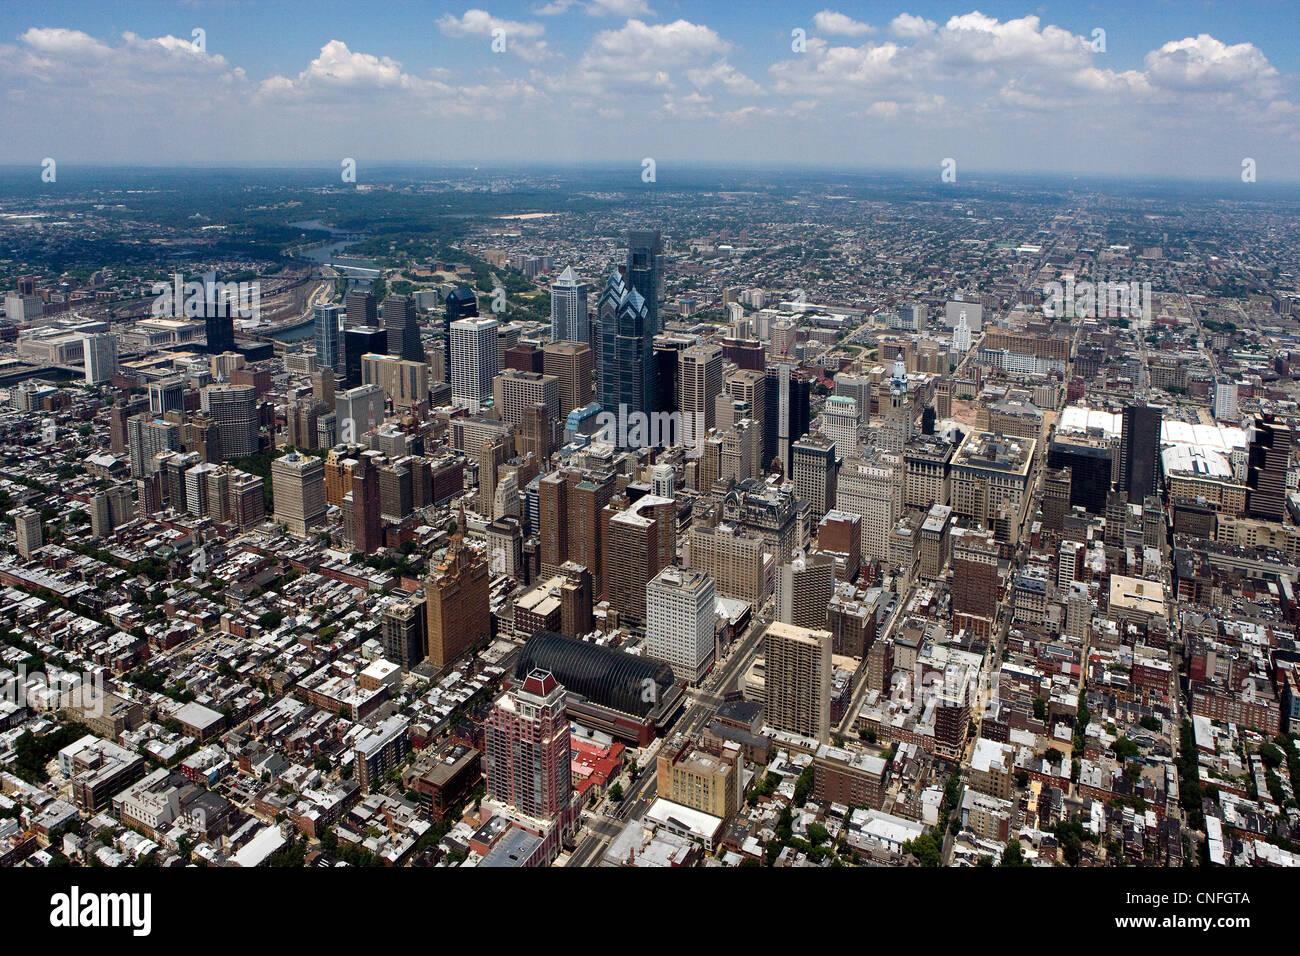 aerial photograph of Philadelphia, Pennsylvania - Stock Image